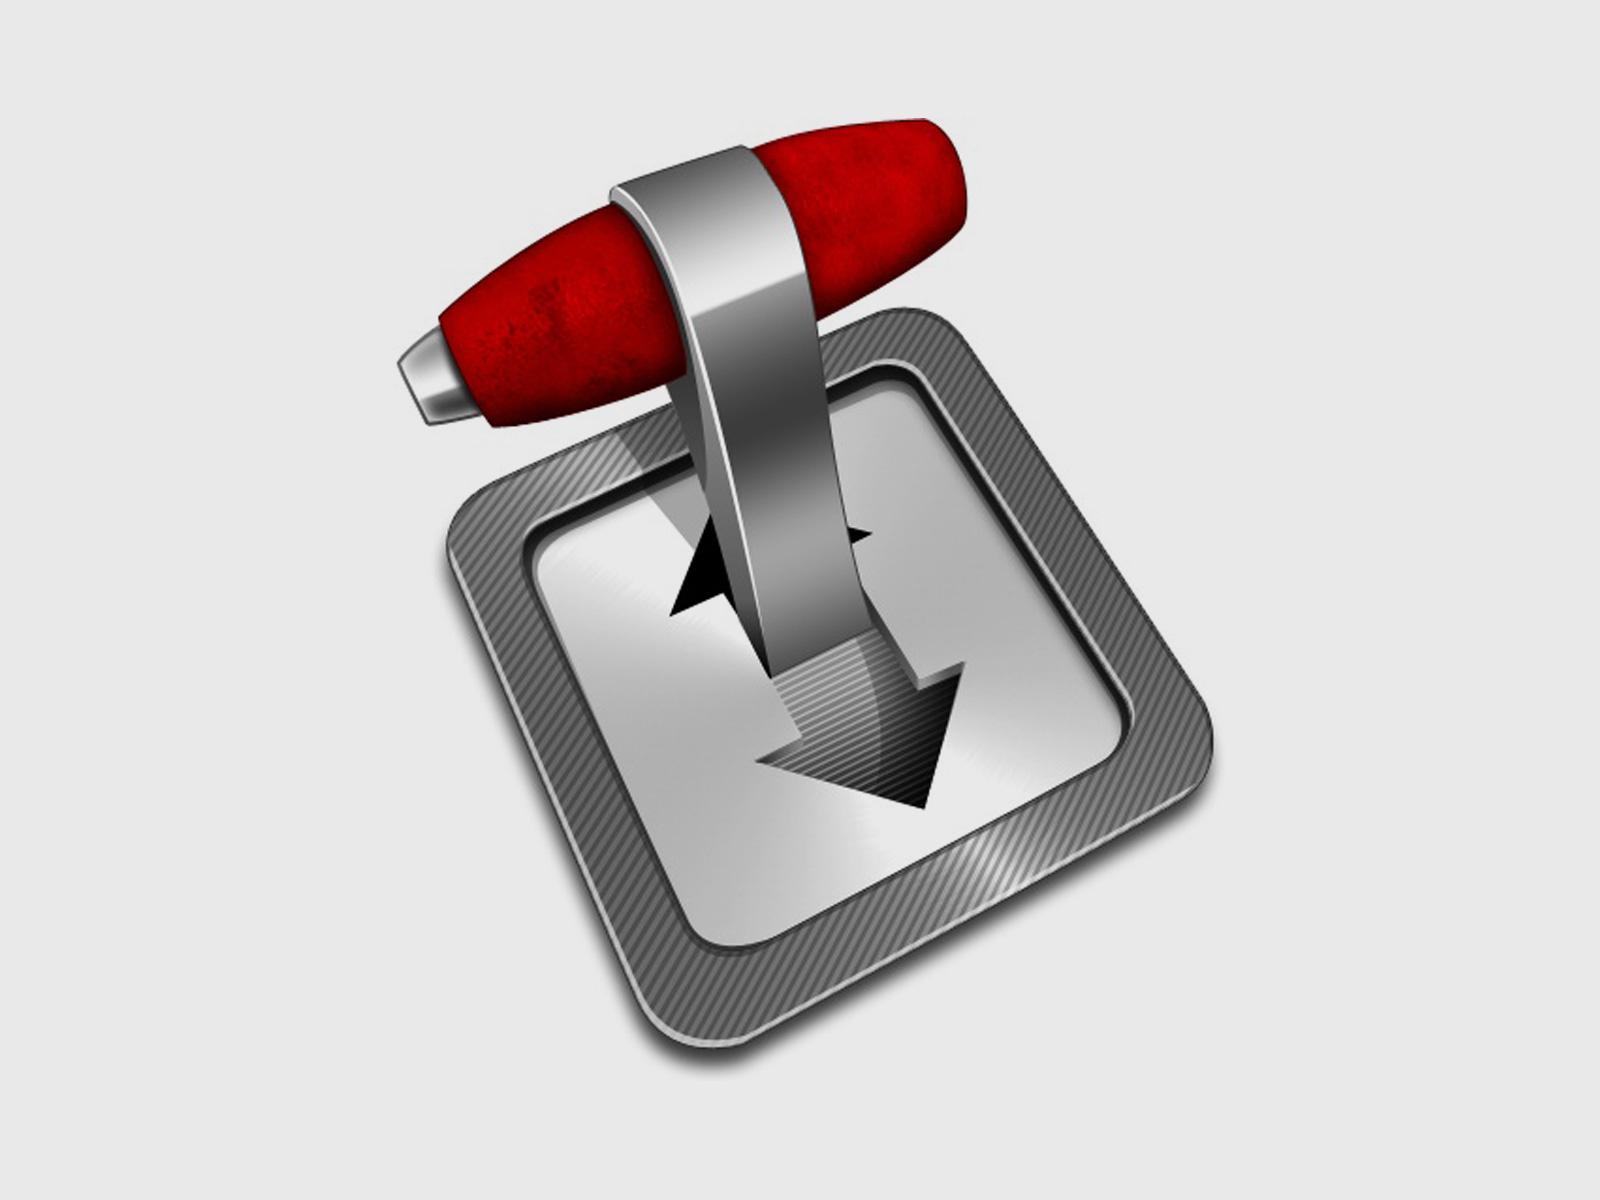 Utorrent for mac 10.5.8 free download